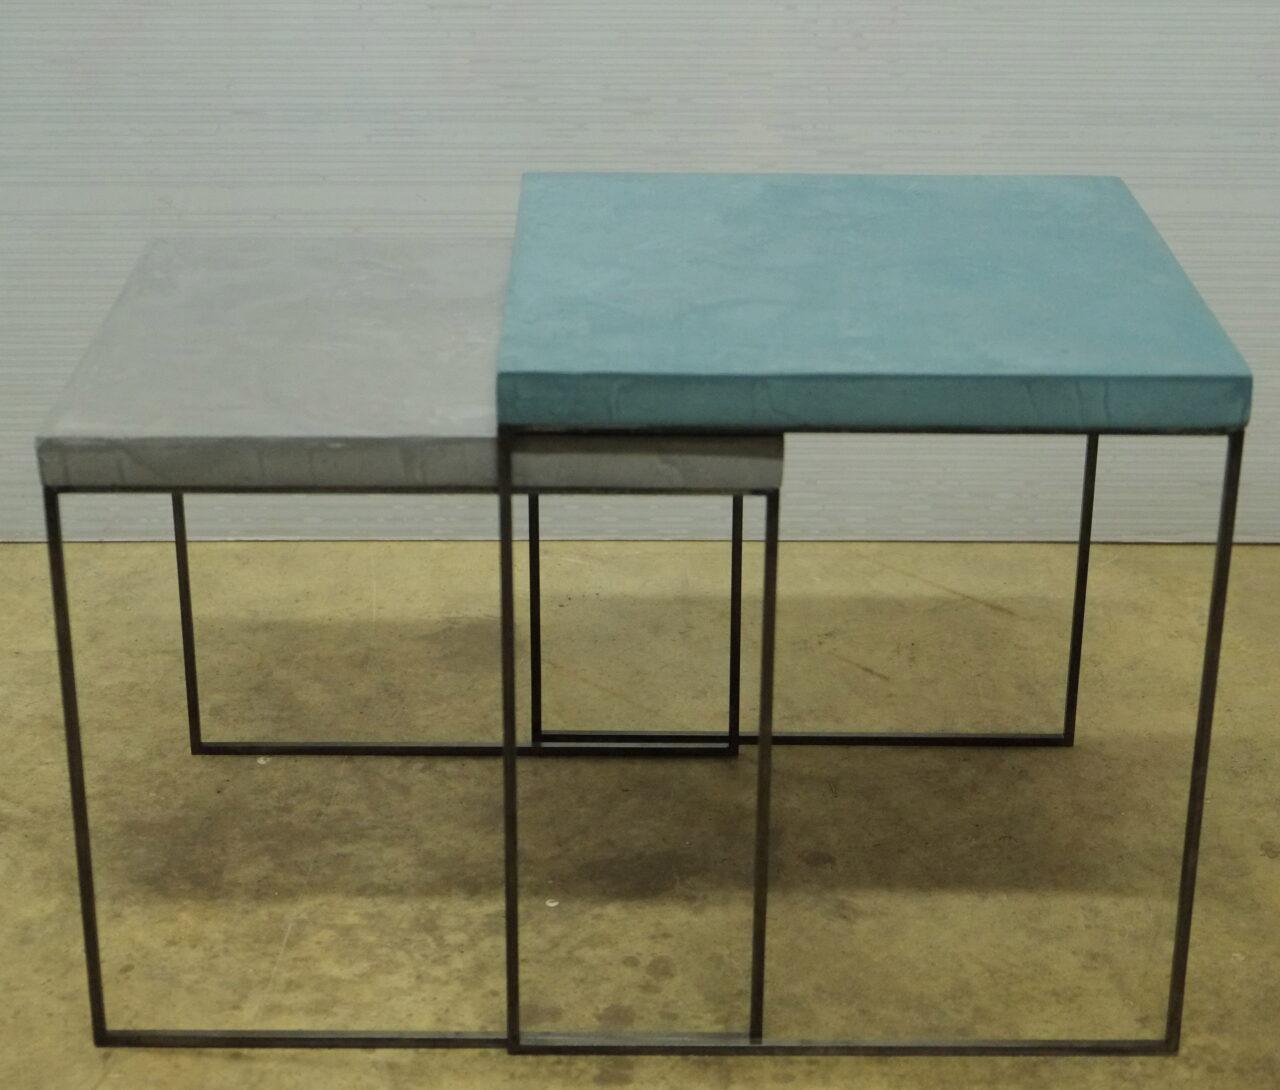 3Tavolino Cementino Tables gigogne béton ciré